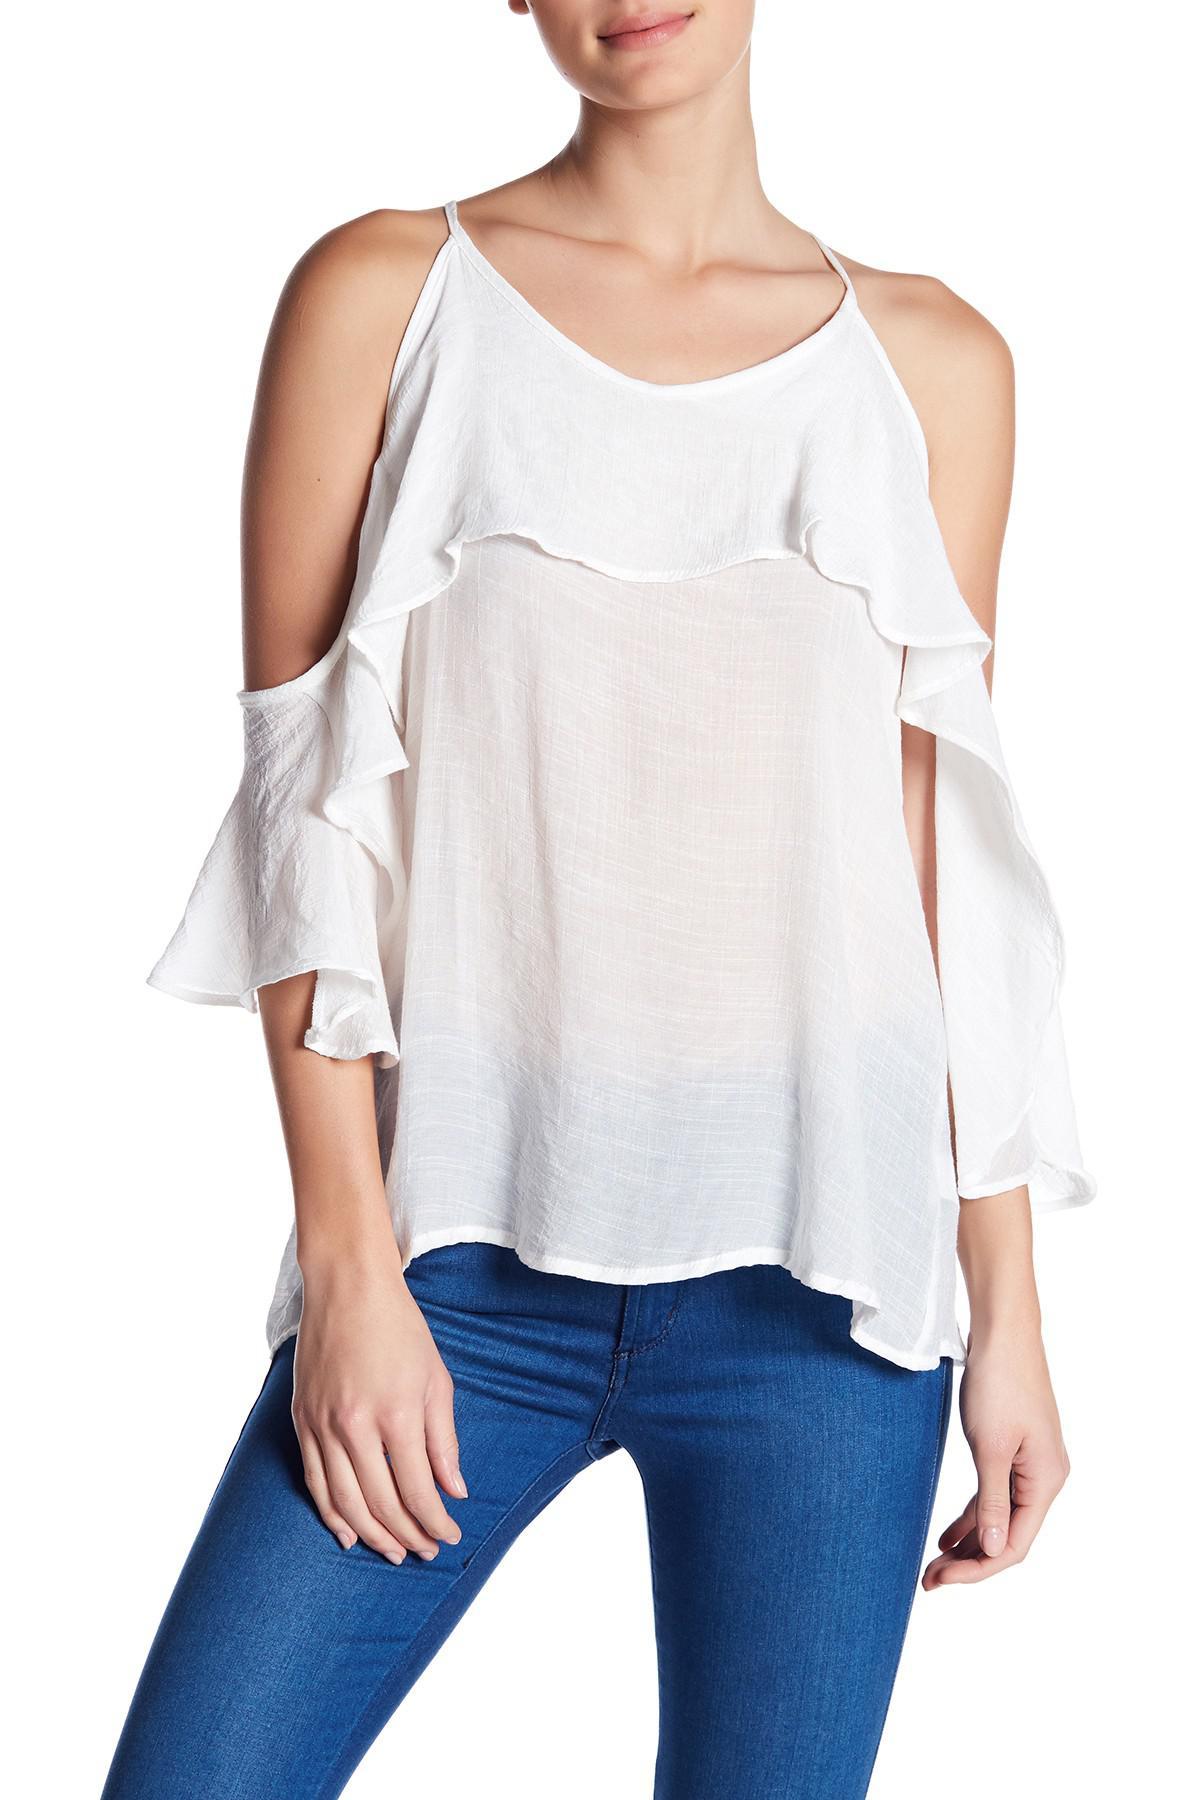 46e8012a88d89 Lyst - Noa Elle Kayla Cold Shoulder Shirt in White